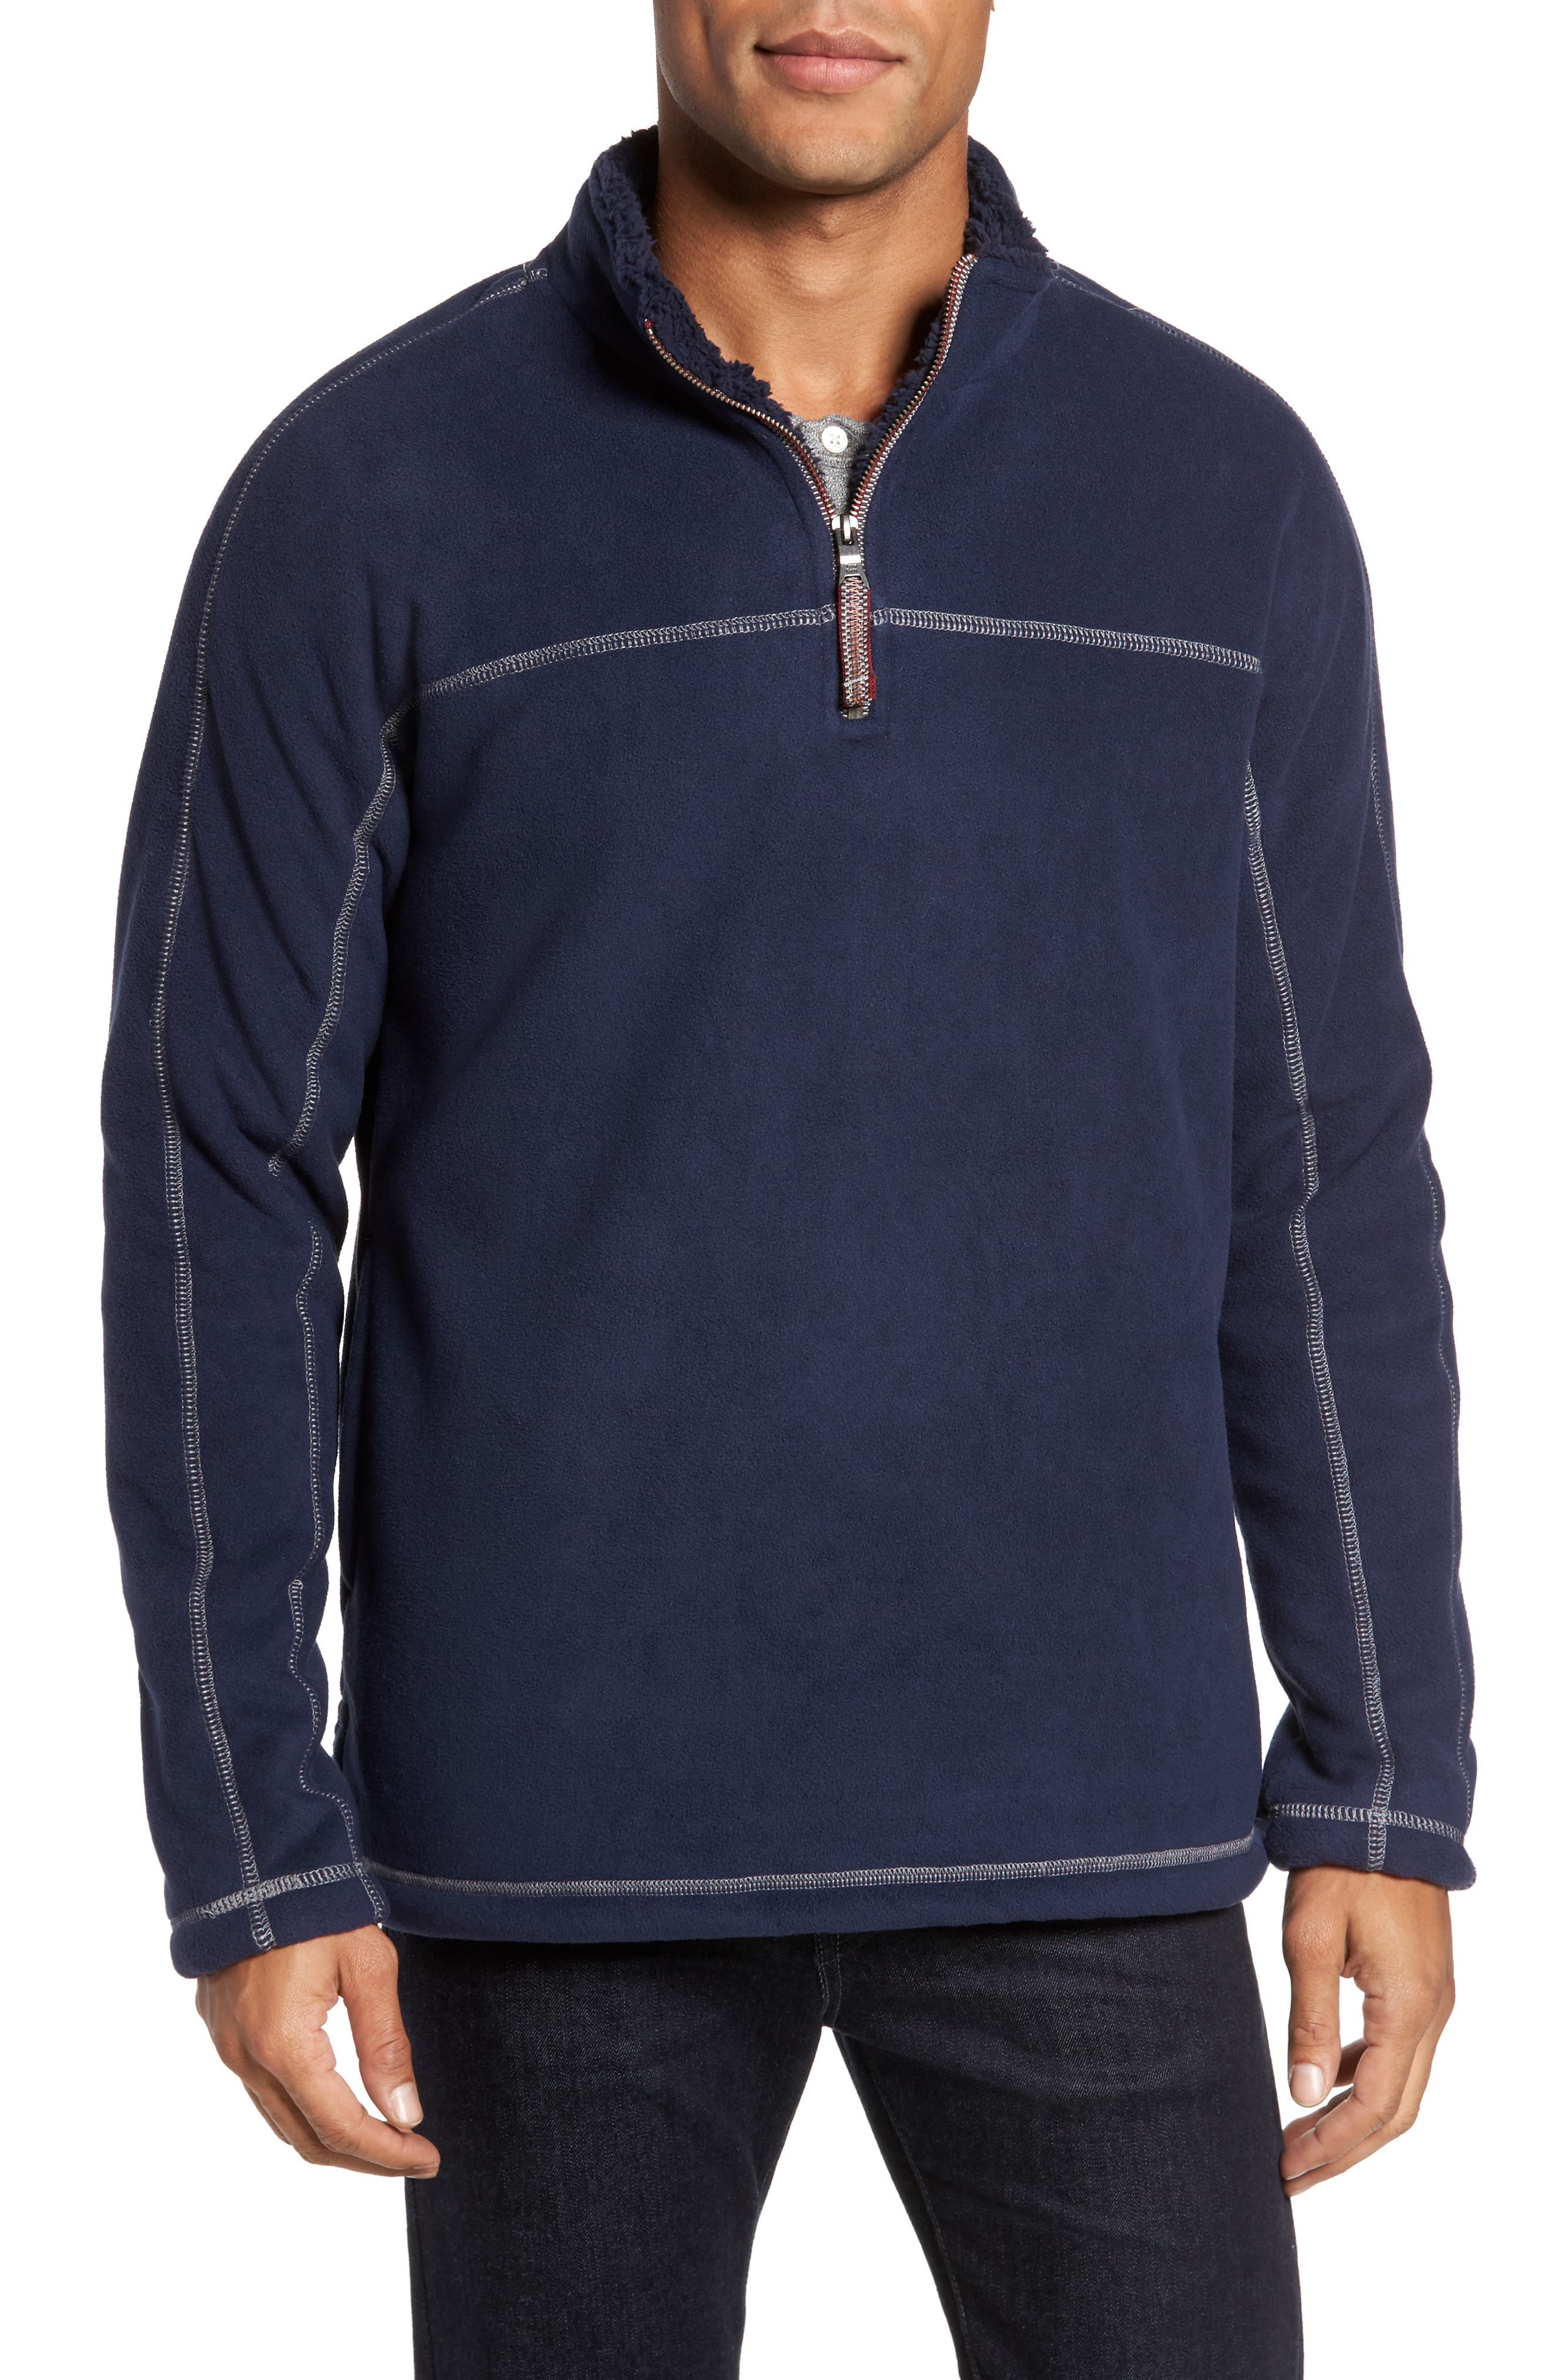 Alternate Image 1 Selected - True Grit Bonded Polar Fleece Lined Pullover